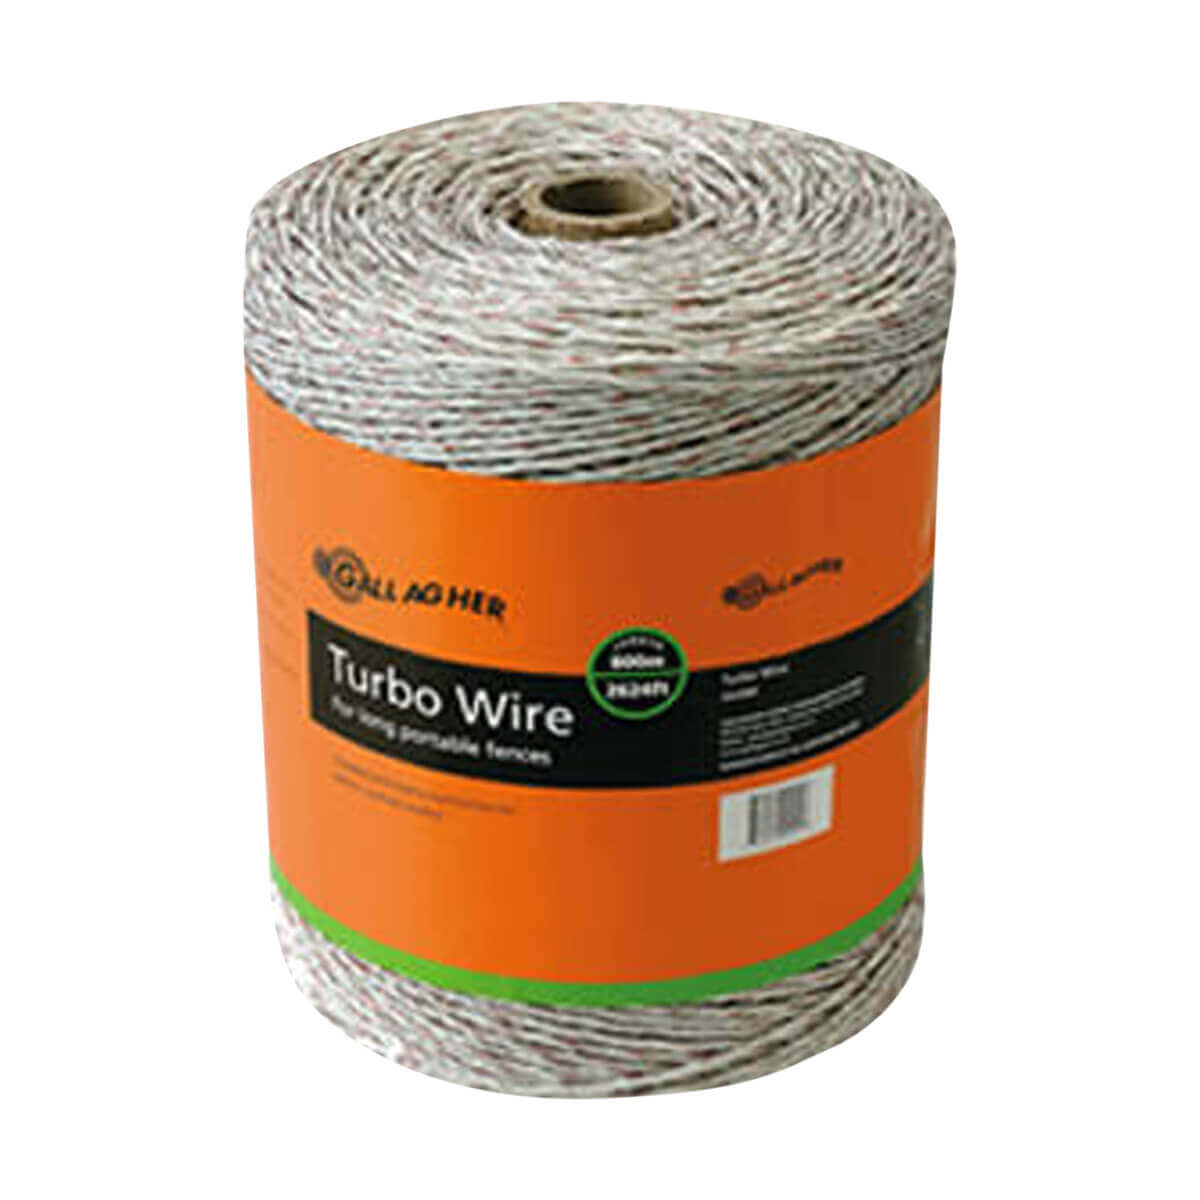 Gallagher Turbo Wire - White - 400 m